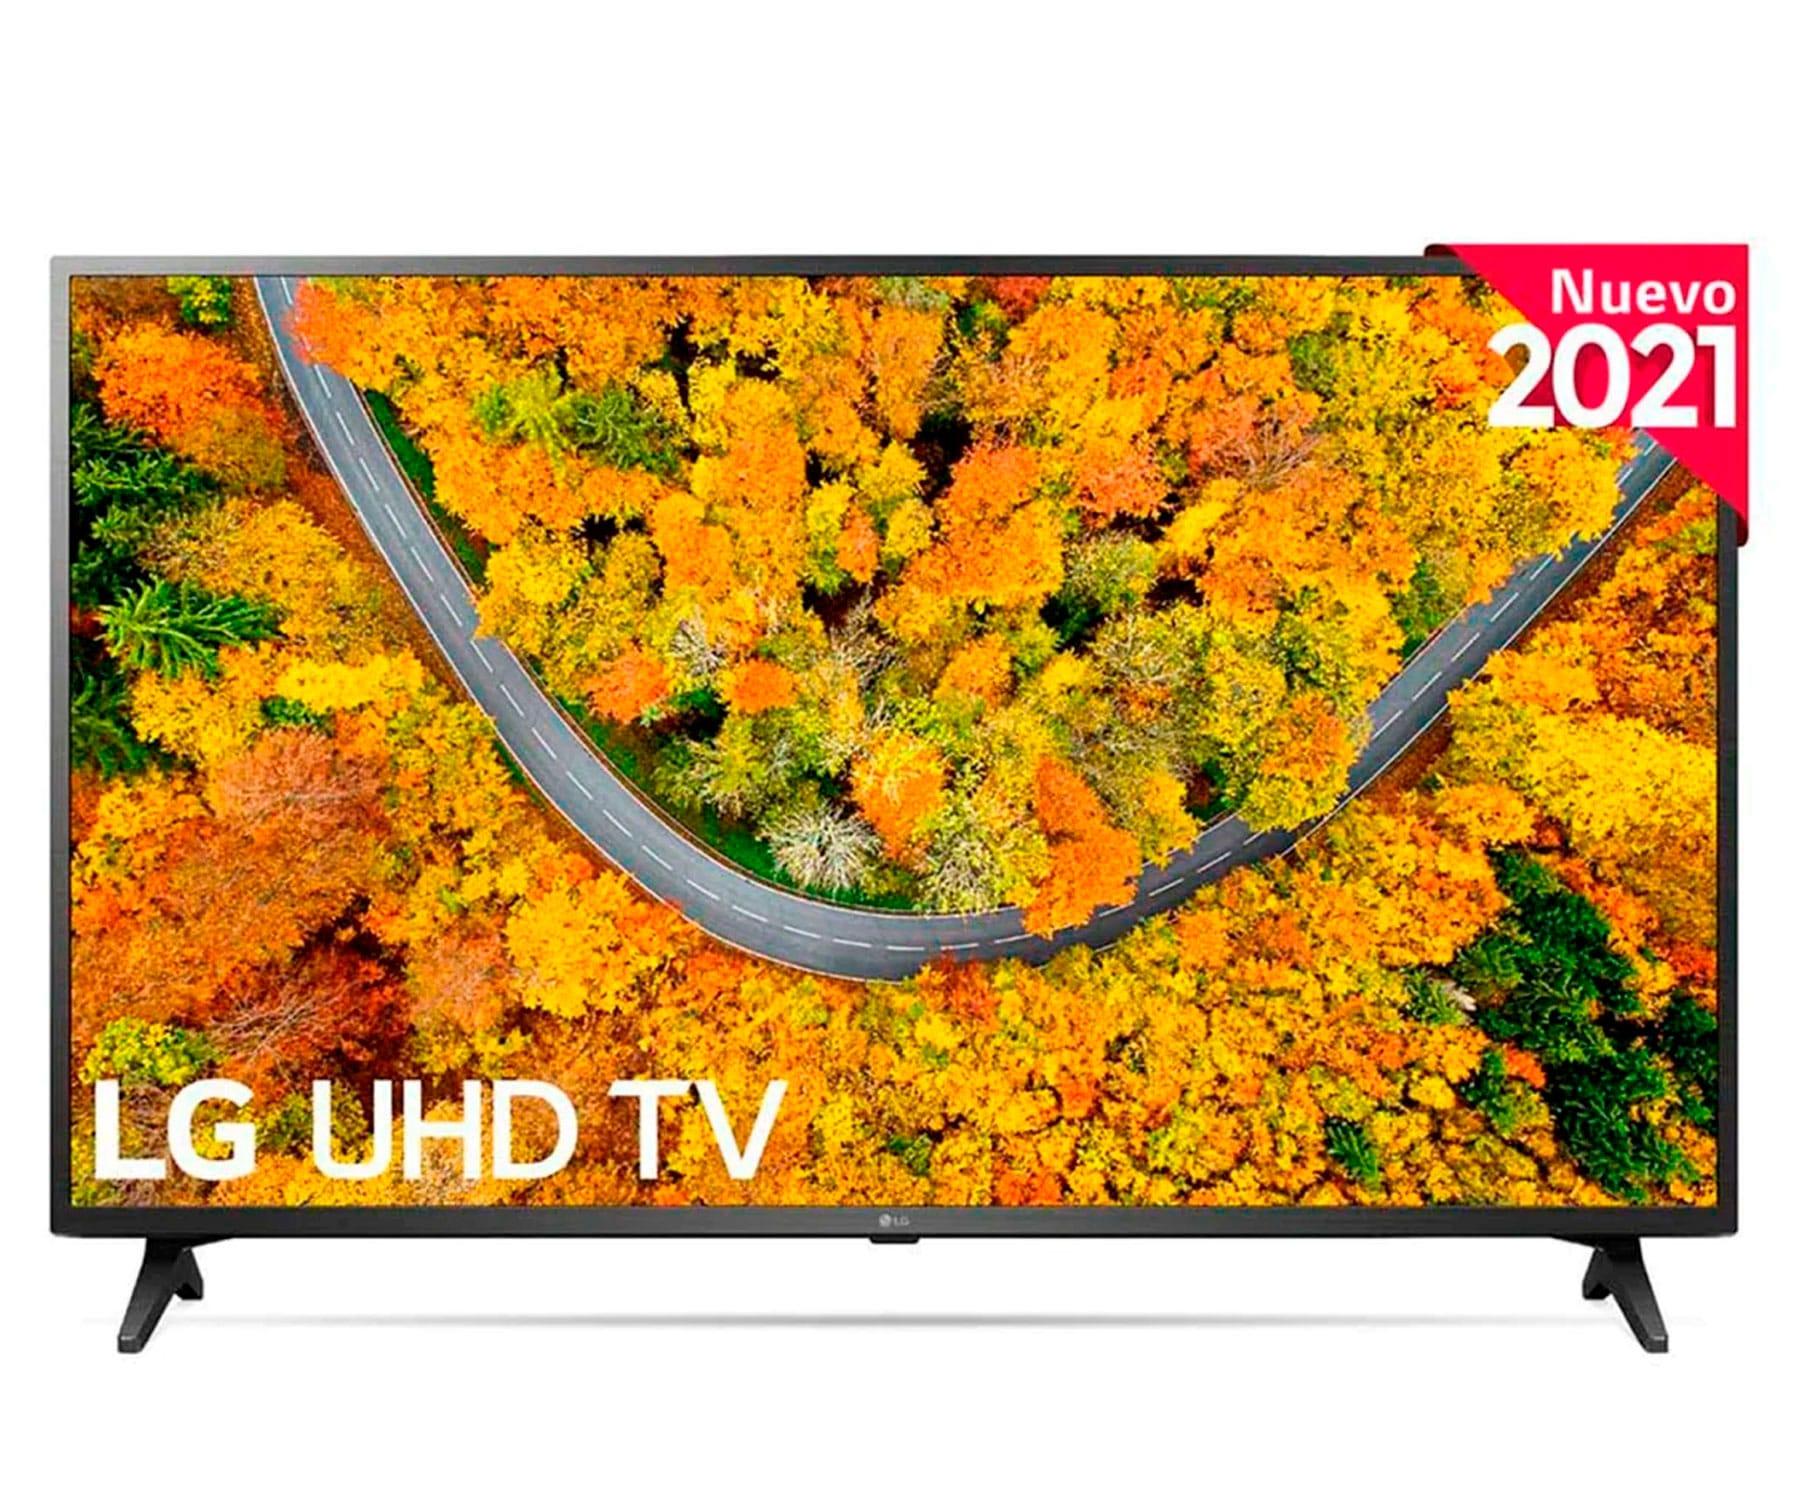 LG 65UP75006LF TELEVISOR SMART TV 65'' UHD 4K HDR